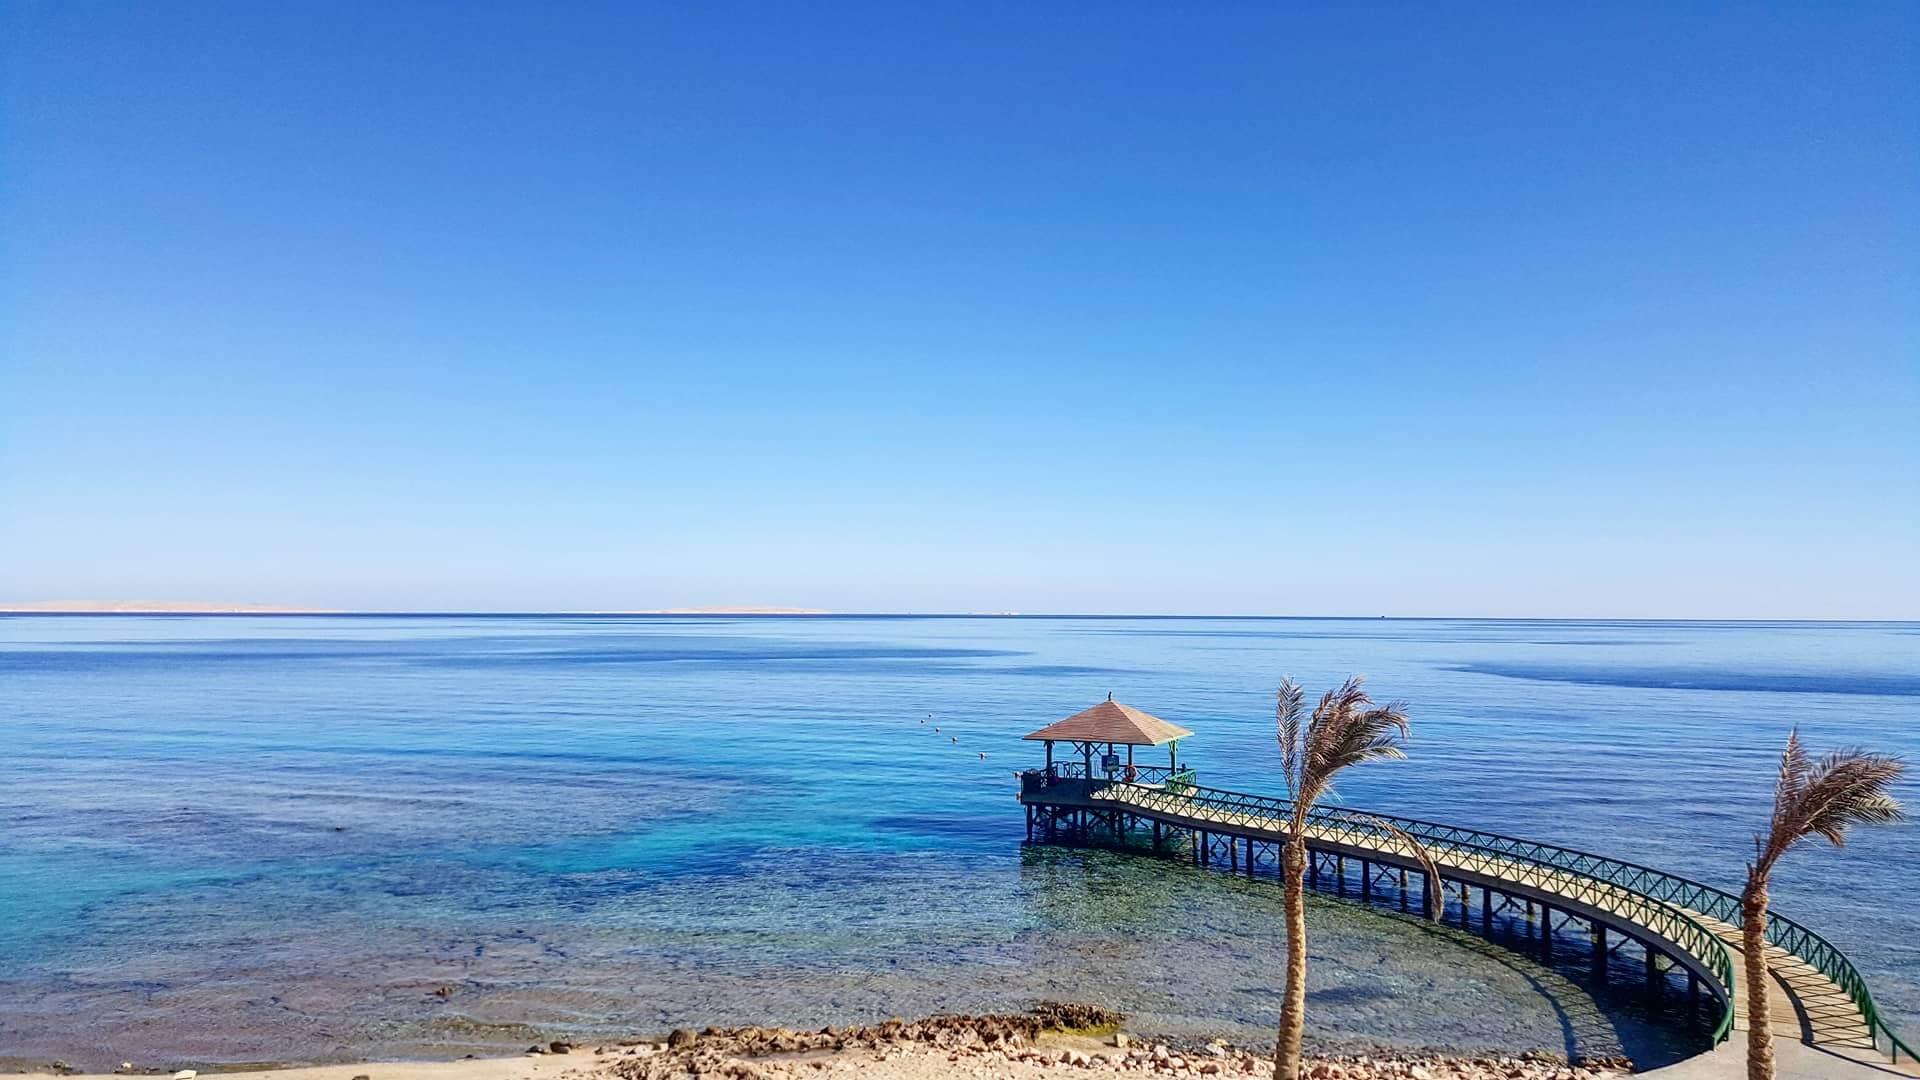 Egypt-REDSEA-Hurghada-DivePro-Academy-Scuba-Diving-Center-